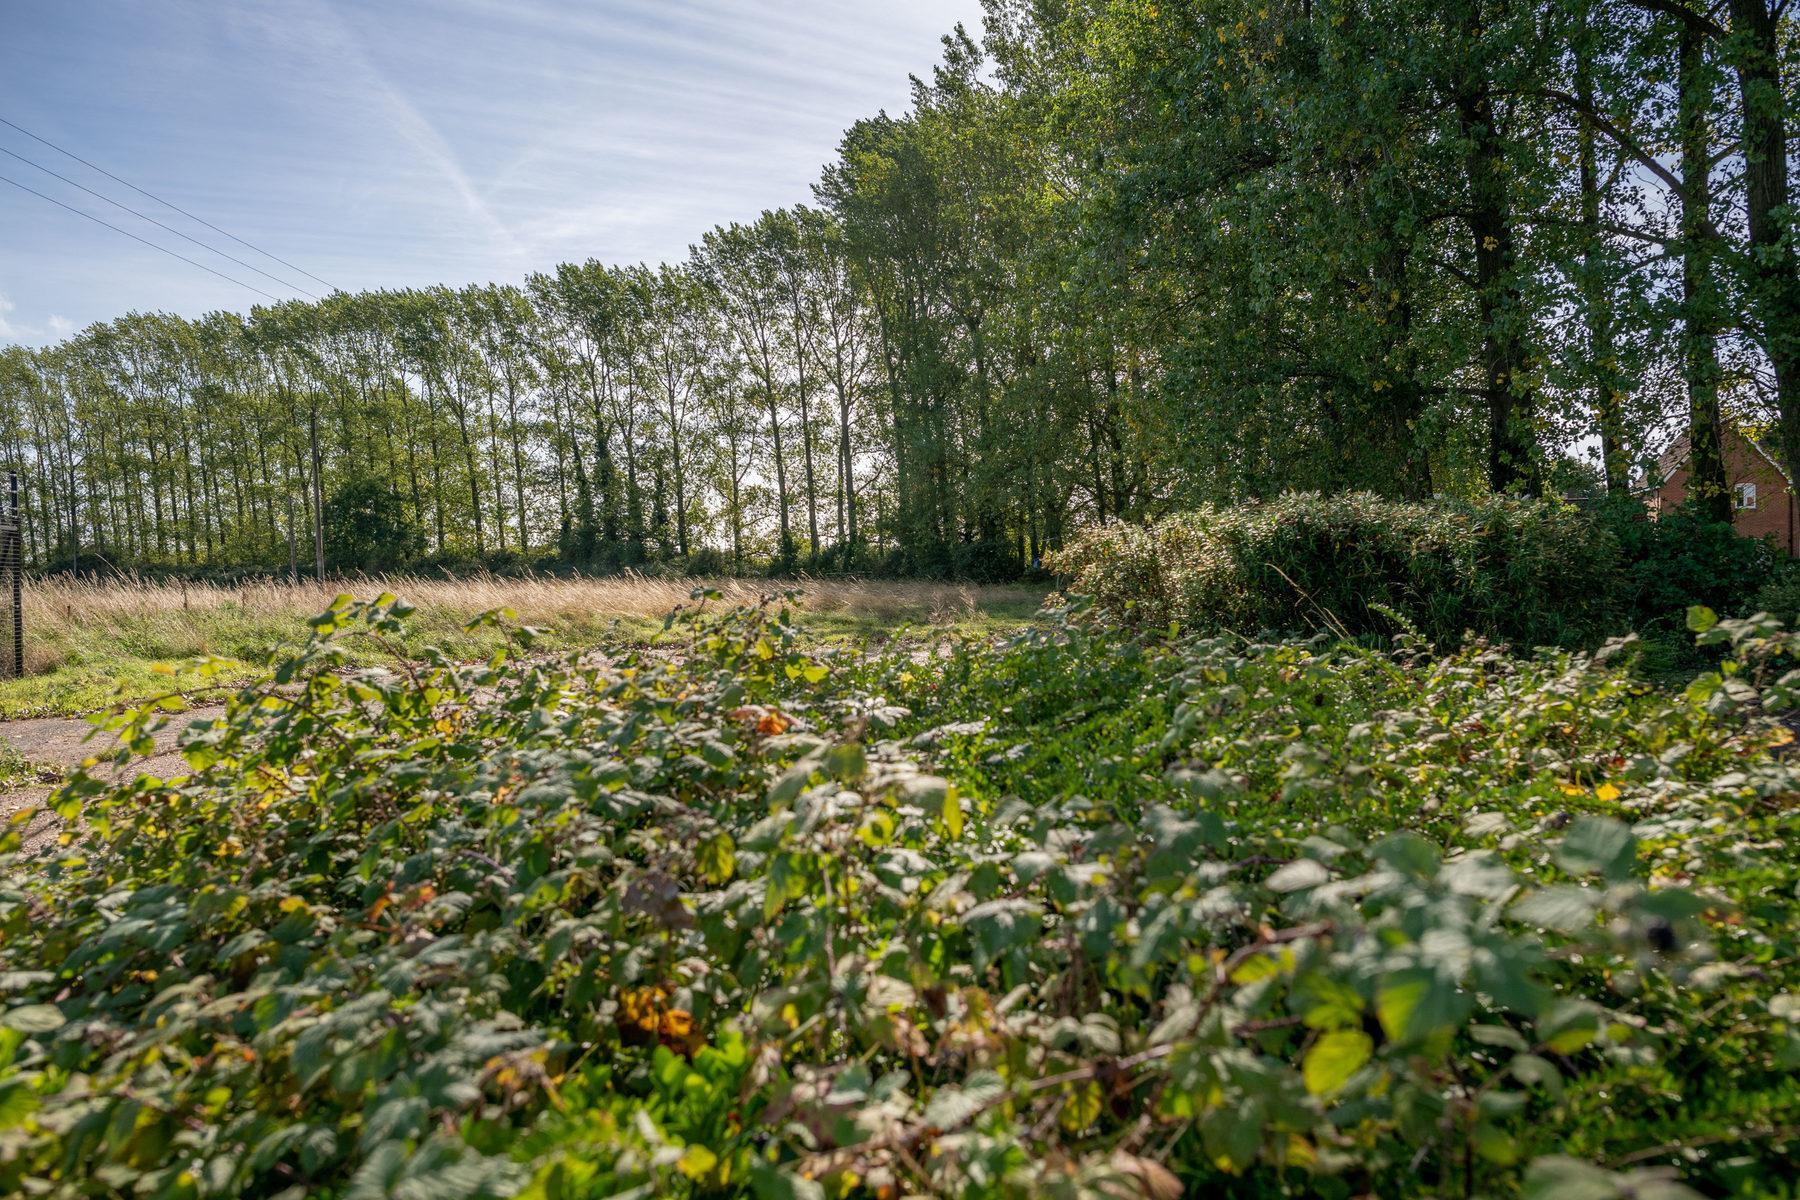 015 Howdale Rabbit Lane 2018